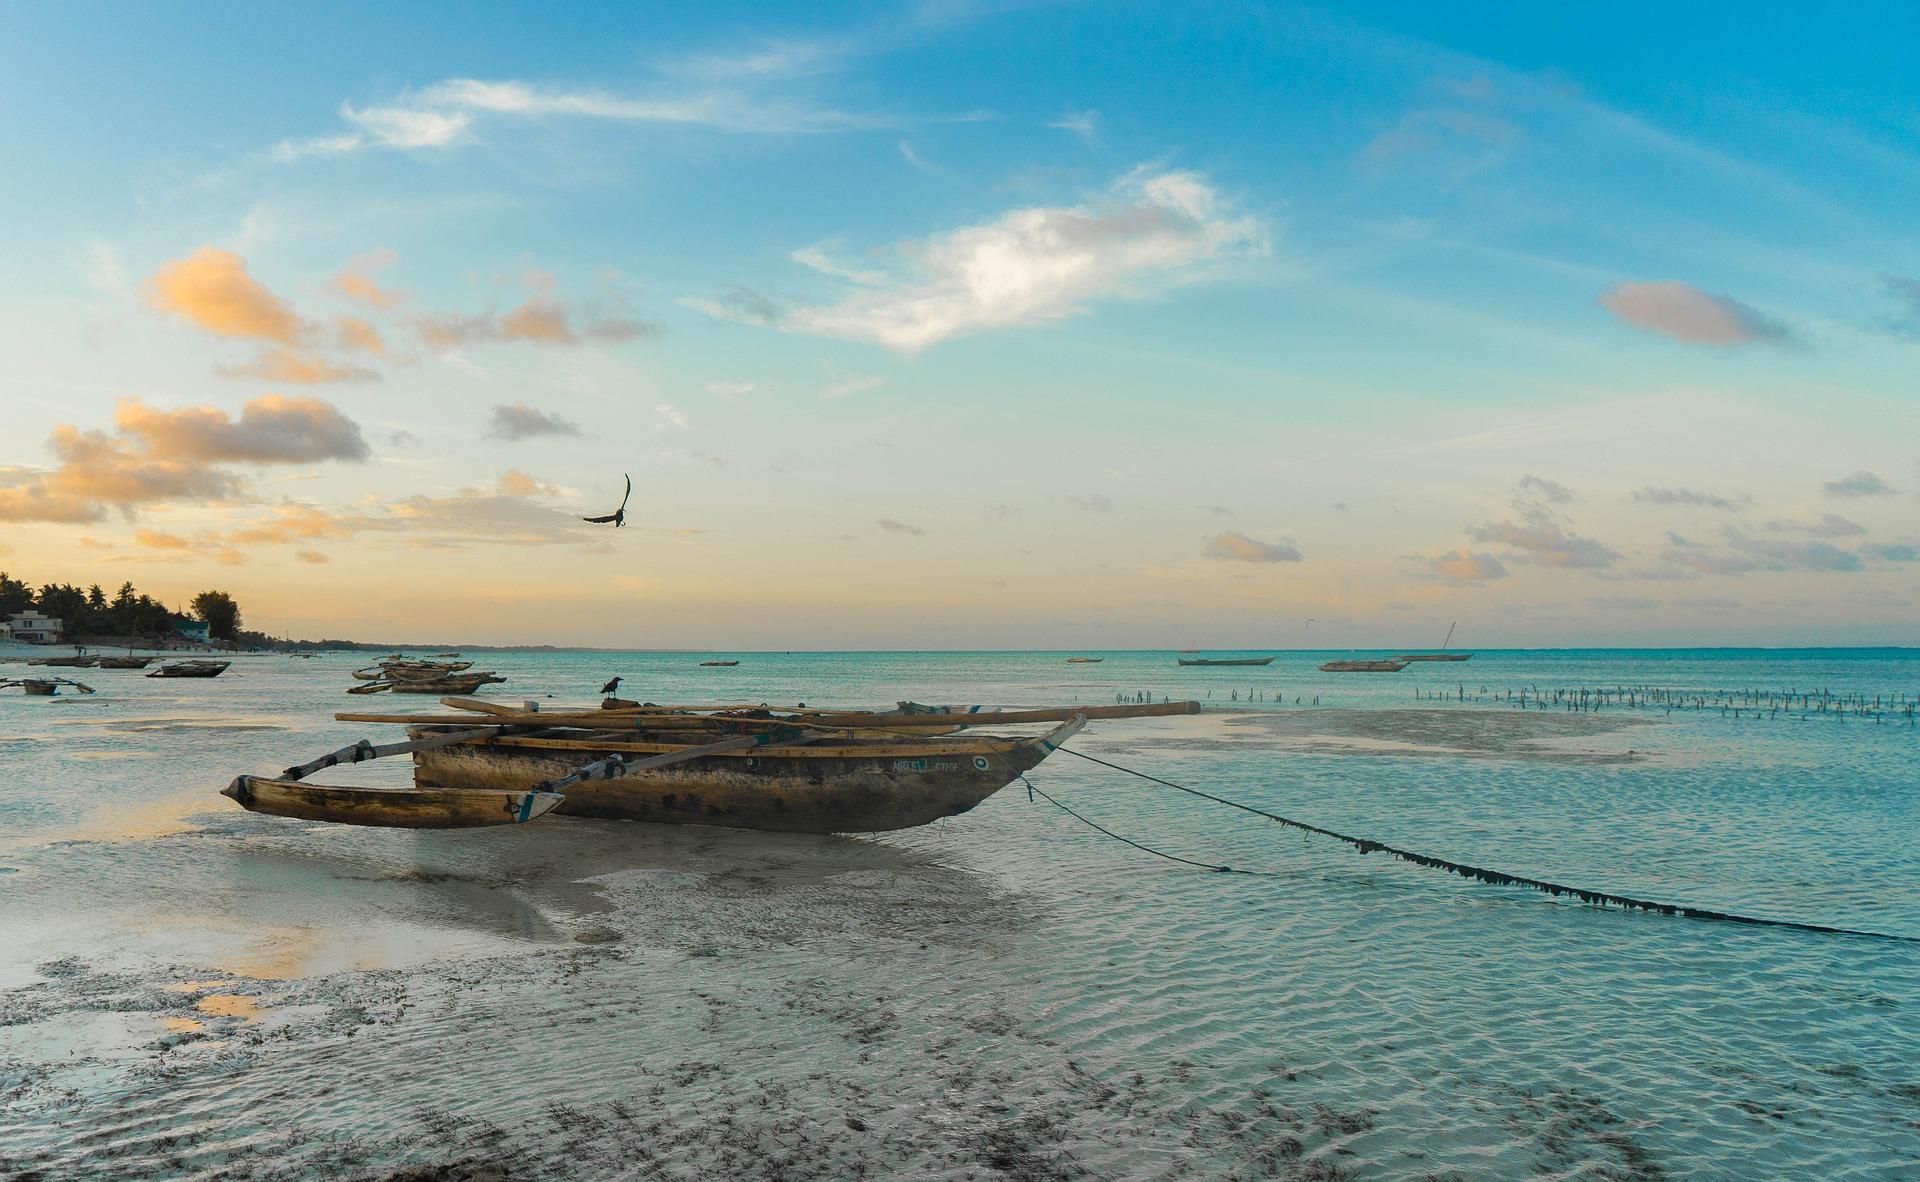 Zanzibar... Home of idyllic beaches, balmy weather and warm tropical waters